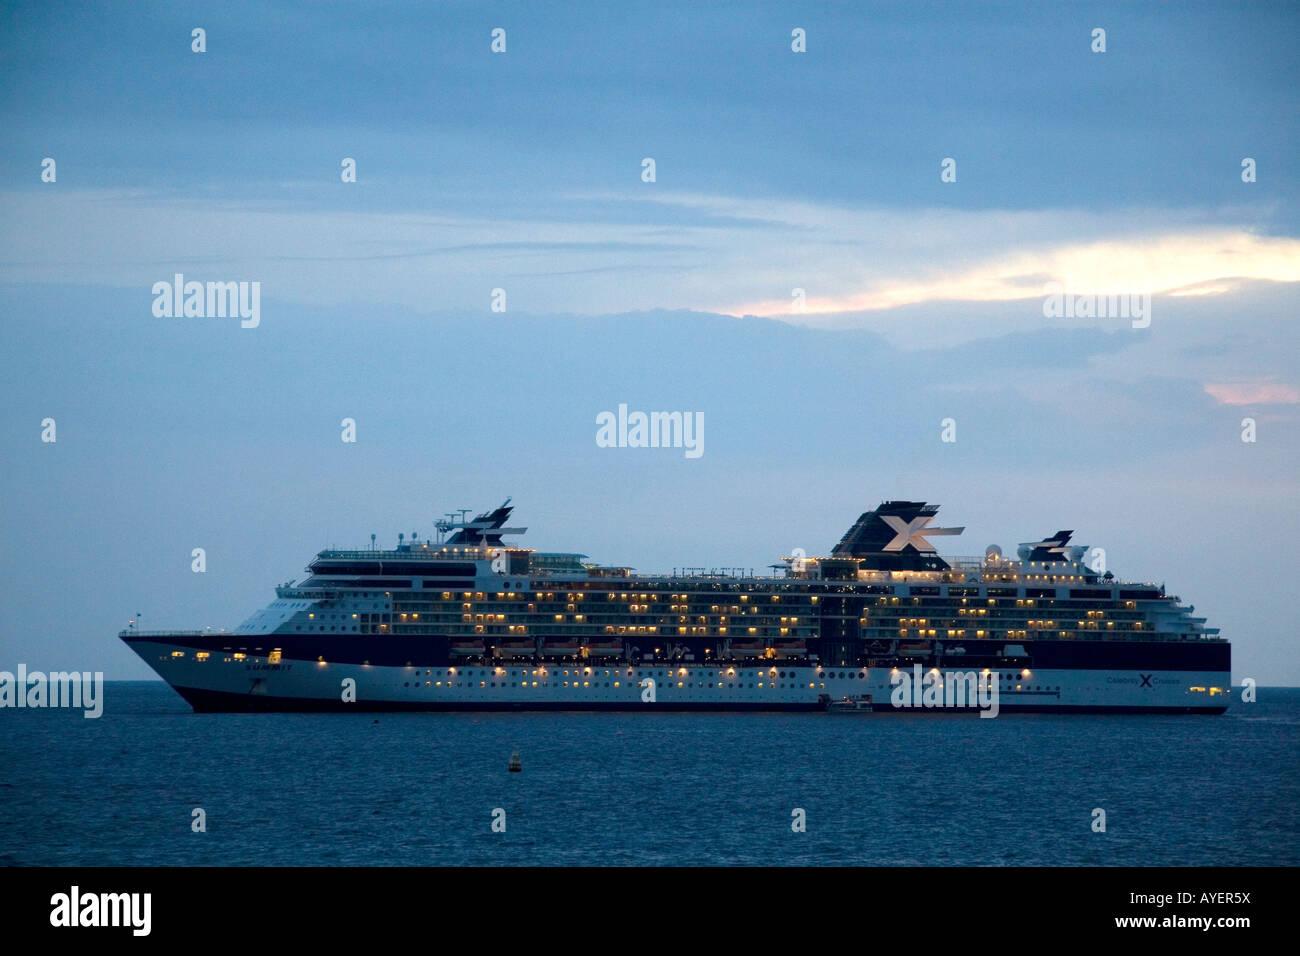 Celebrity Cruises to Hawaii | Hawaiian Celebrity Cruise